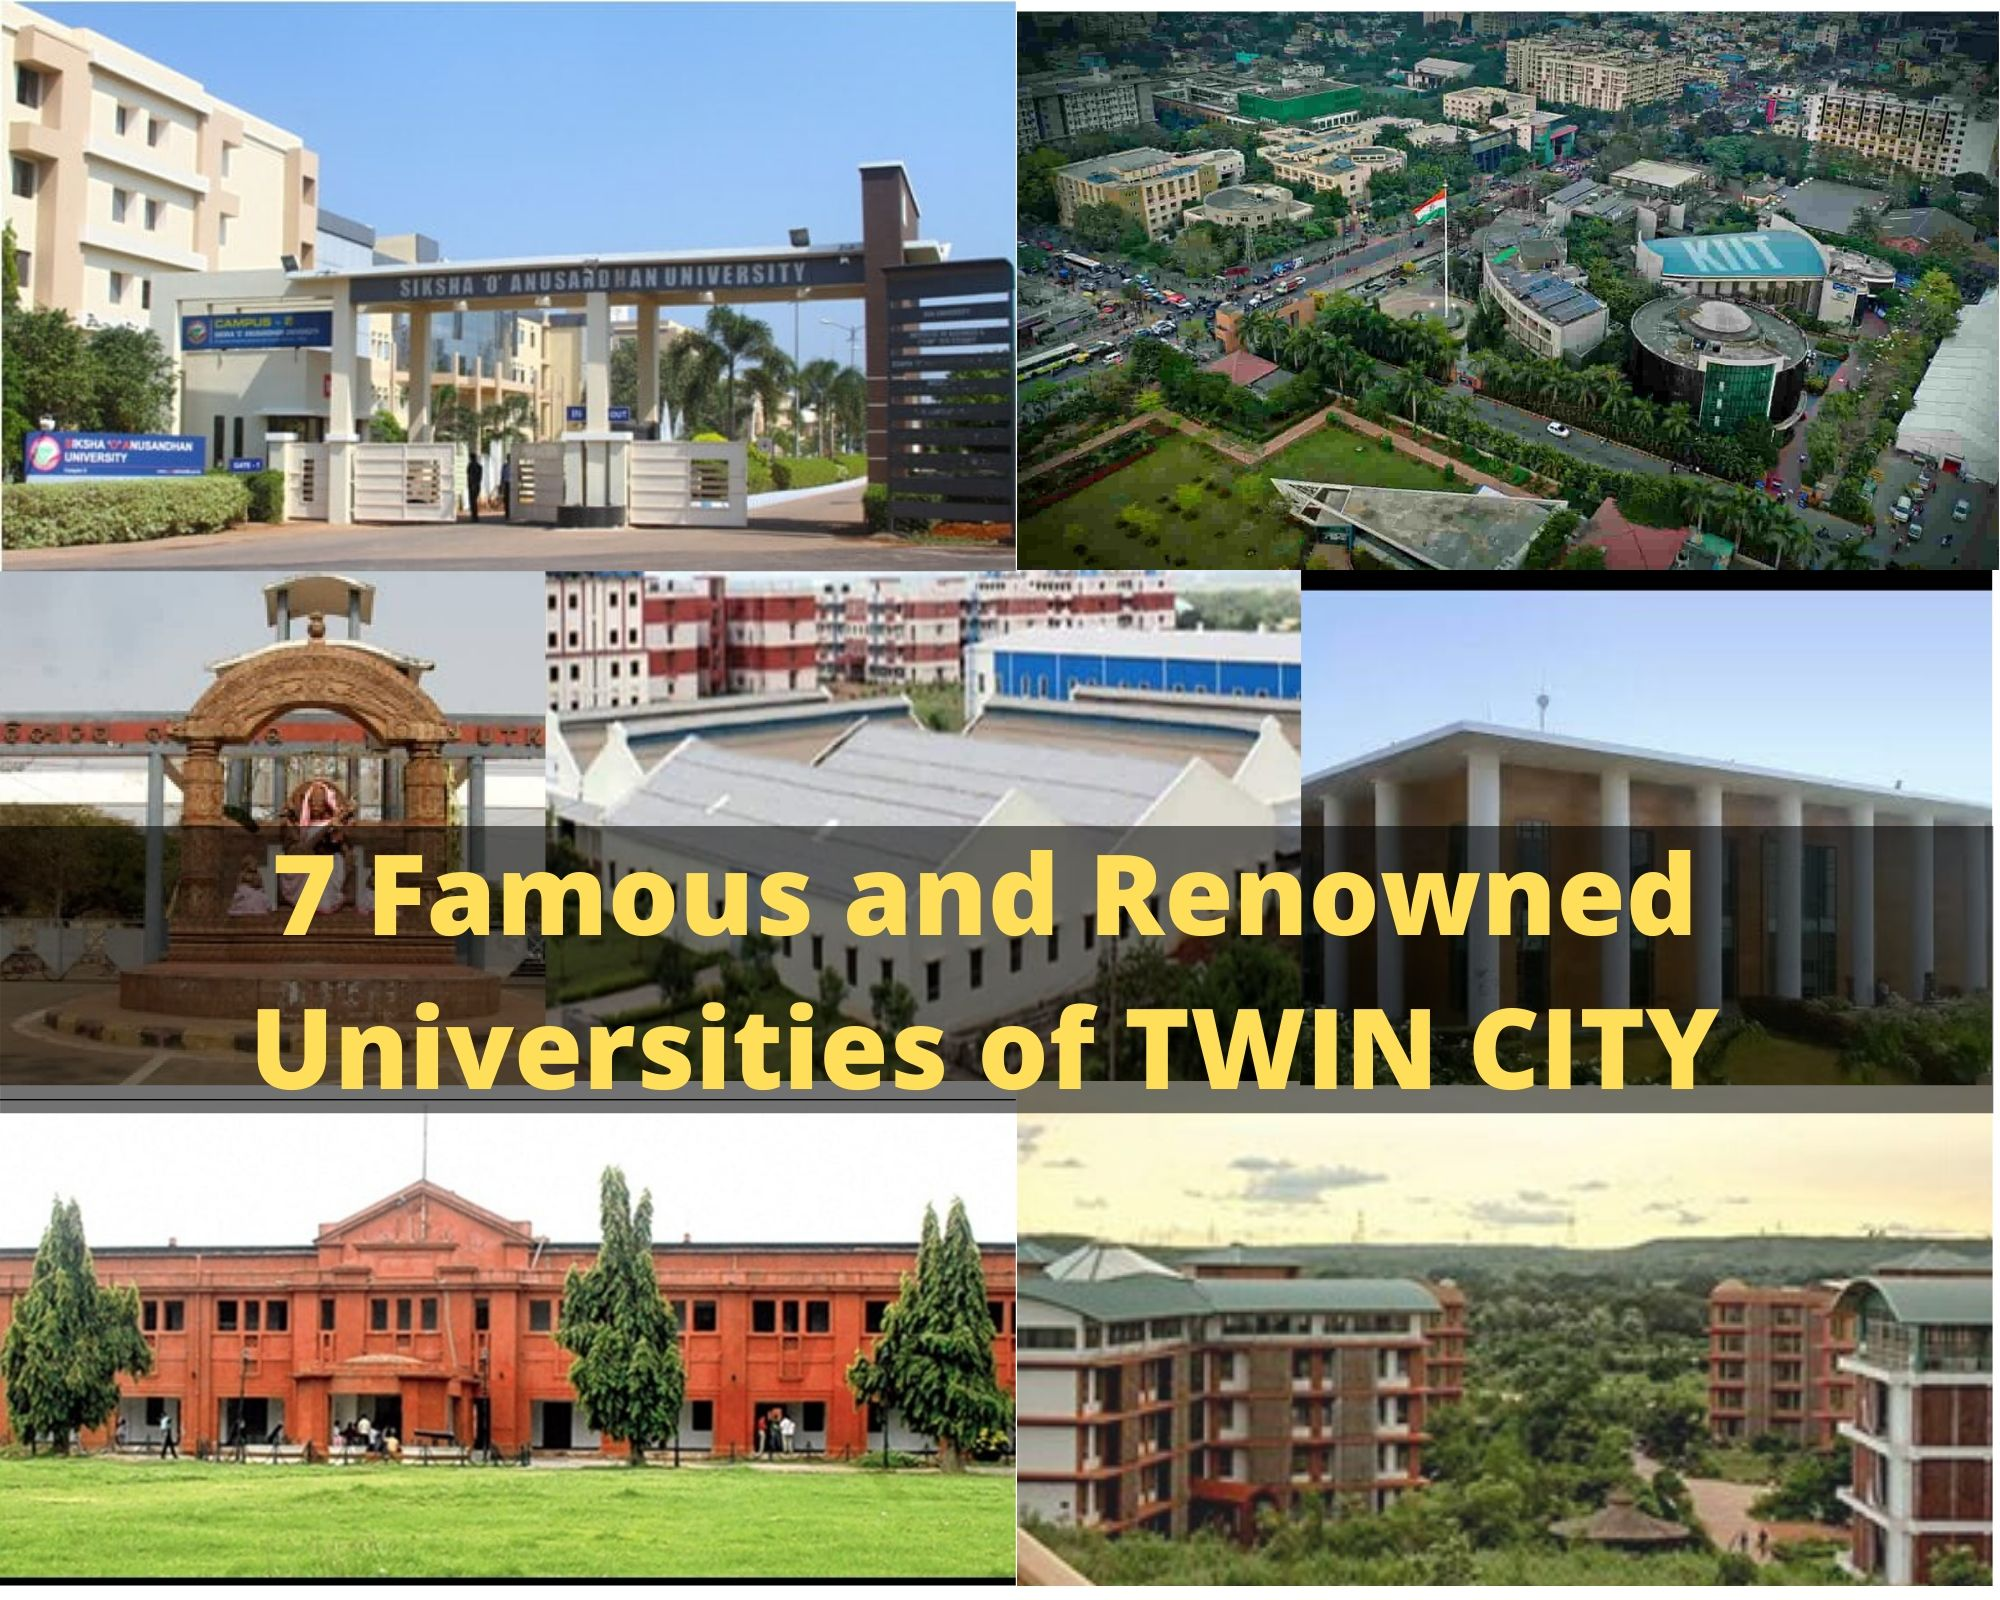 7 university of twin city